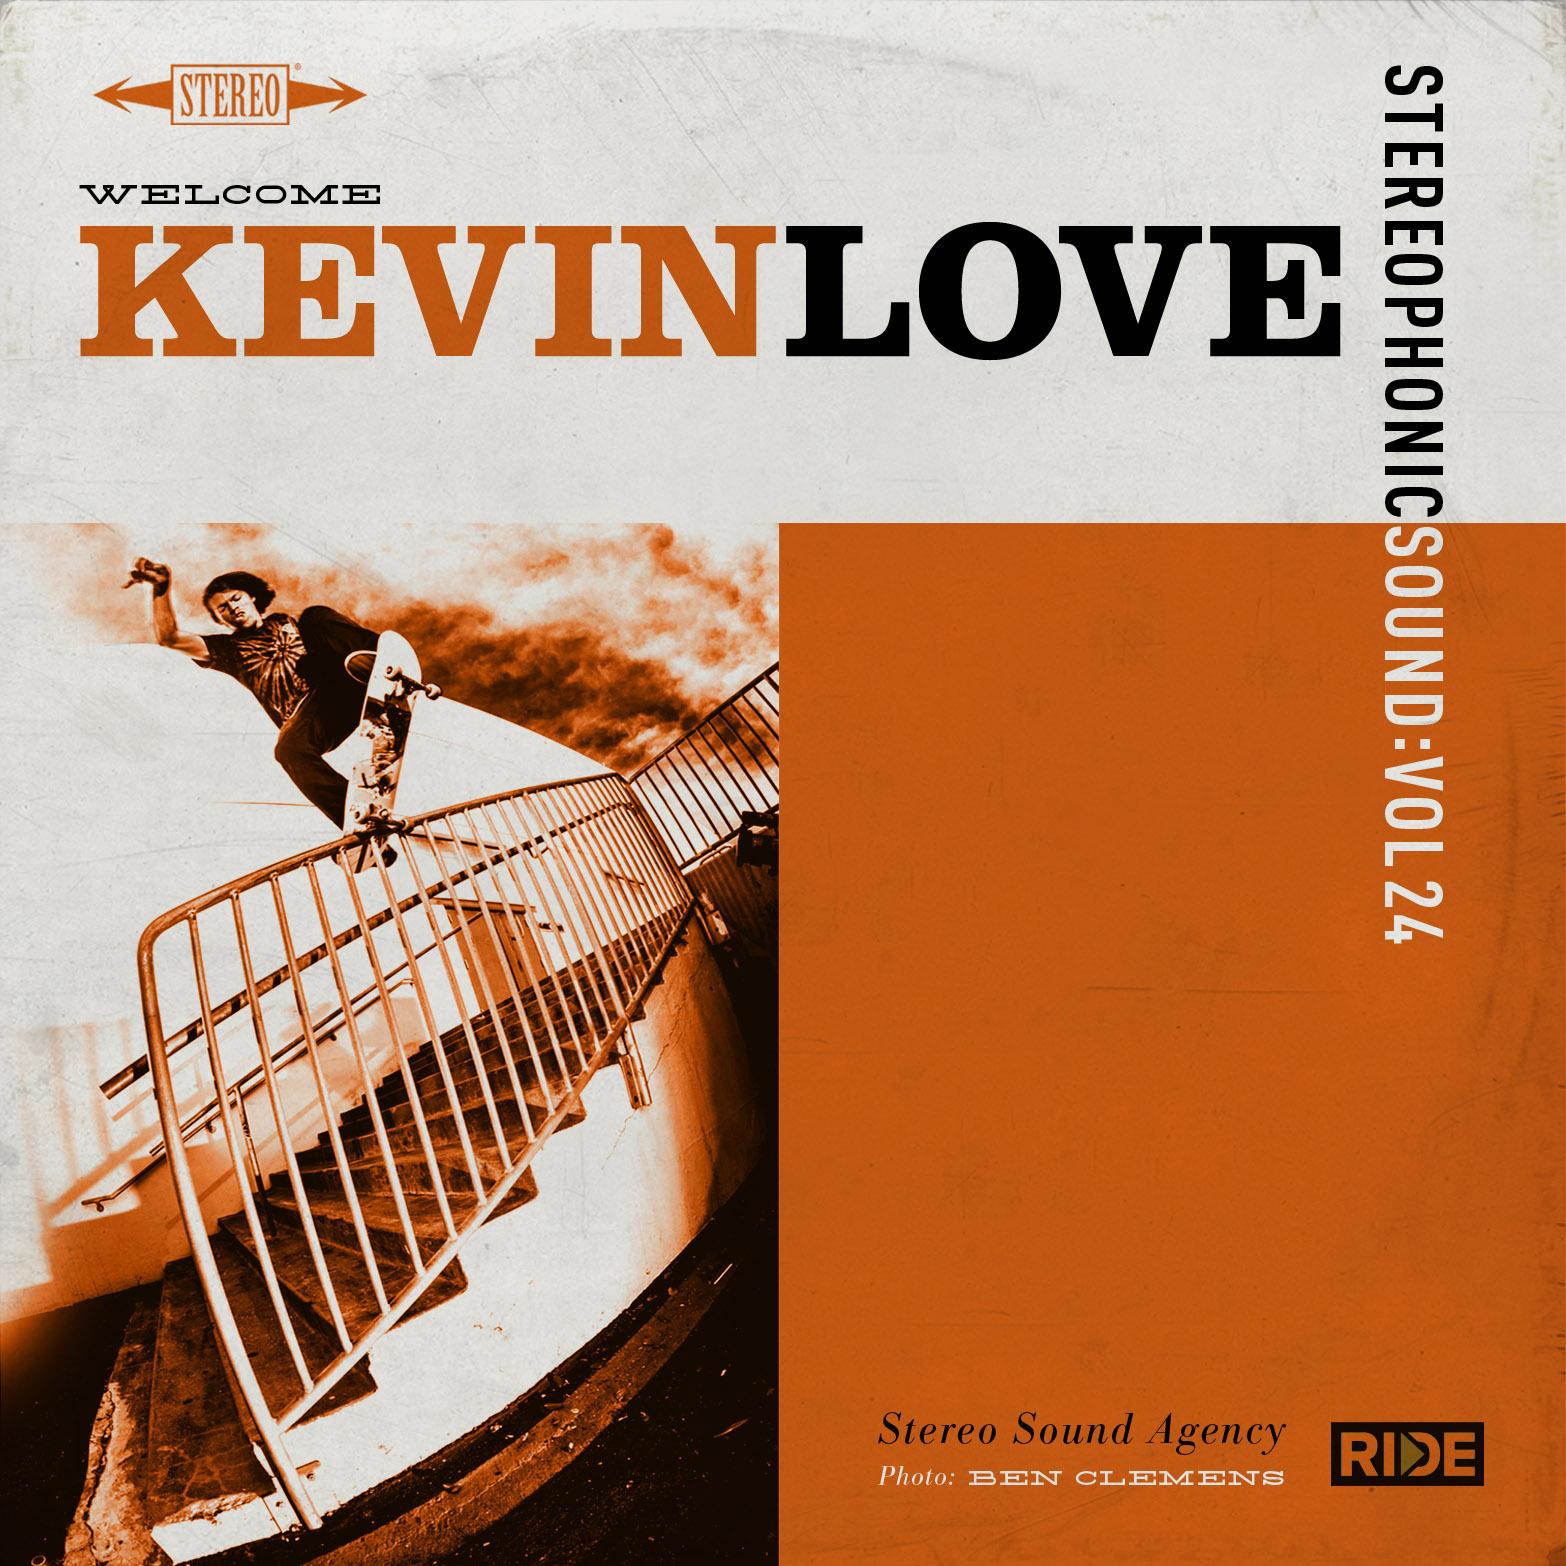 Stereophonic-sound-volume-24.jpg